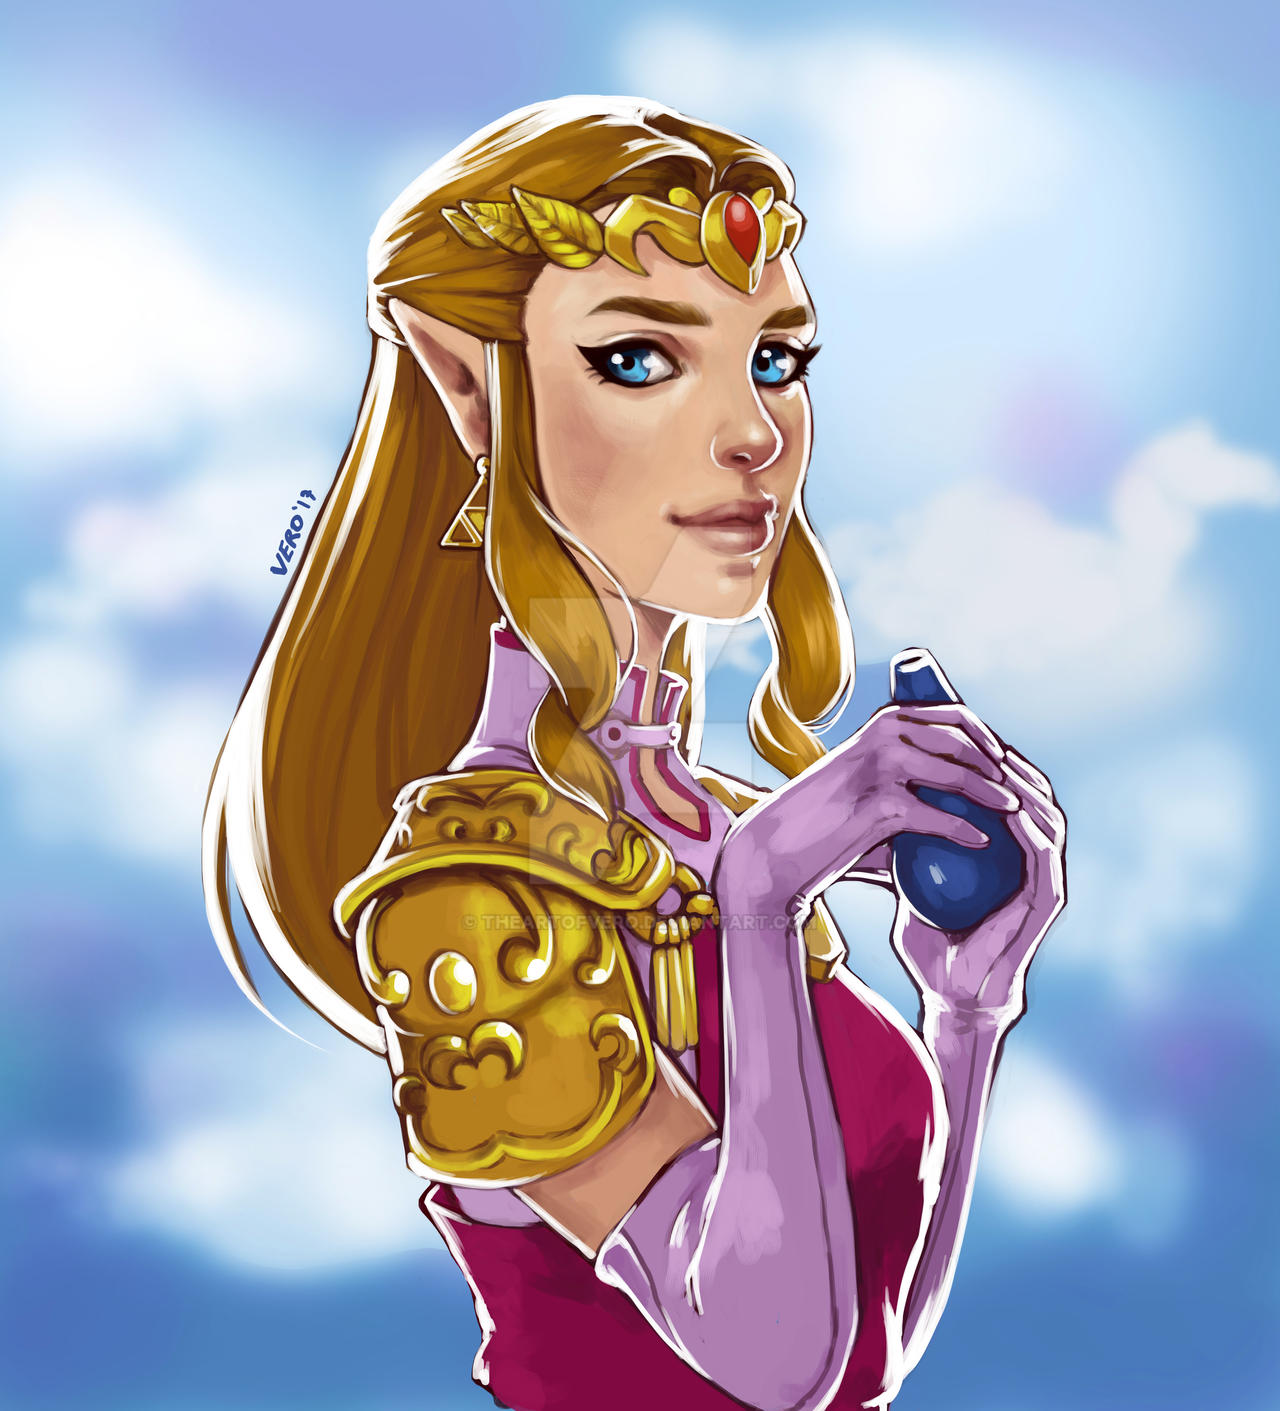 Princess Zelda Ocarina Of Time By Theartofvero On Deviantart